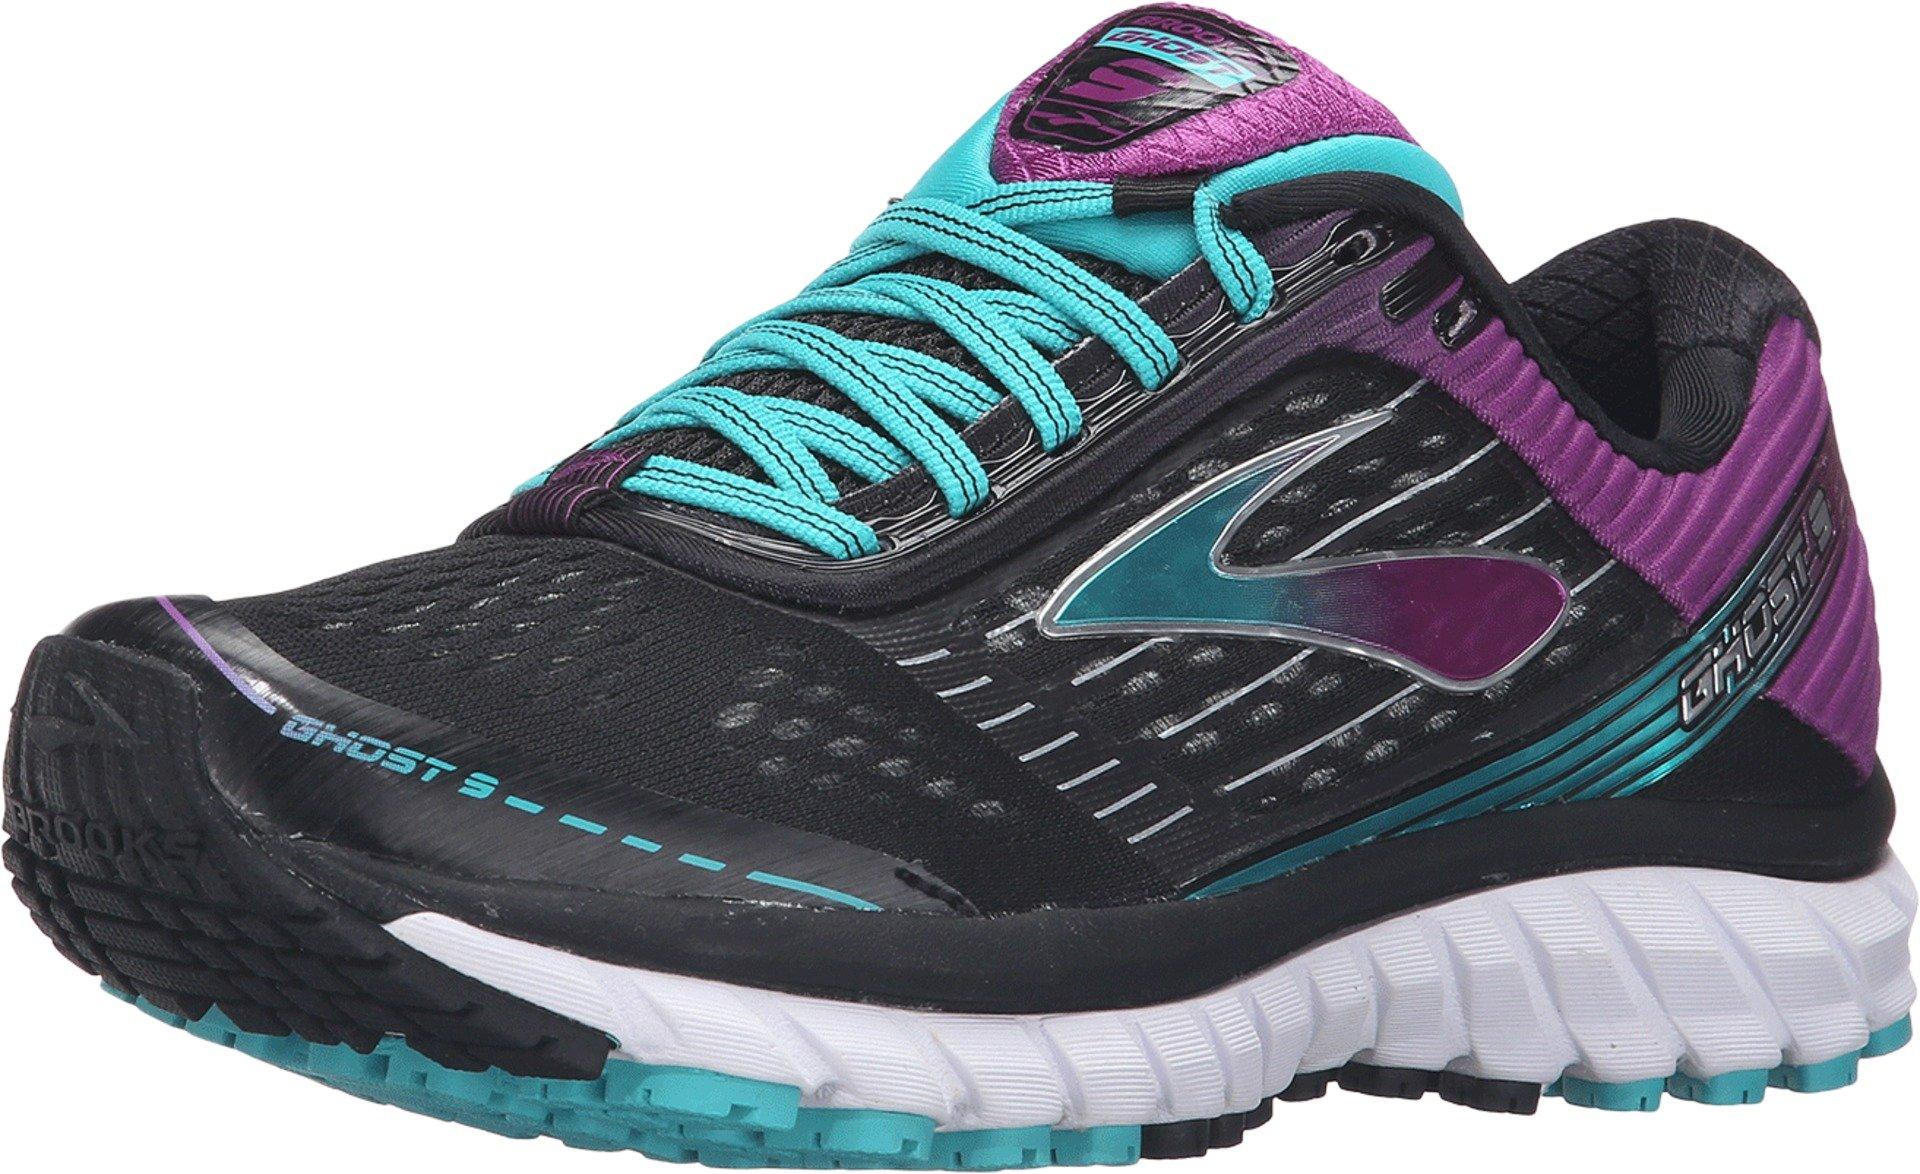 Brooks Women's Ghost 9 Black/Sparkling Grape/Ceramic Running shoes - 12 B(M) US